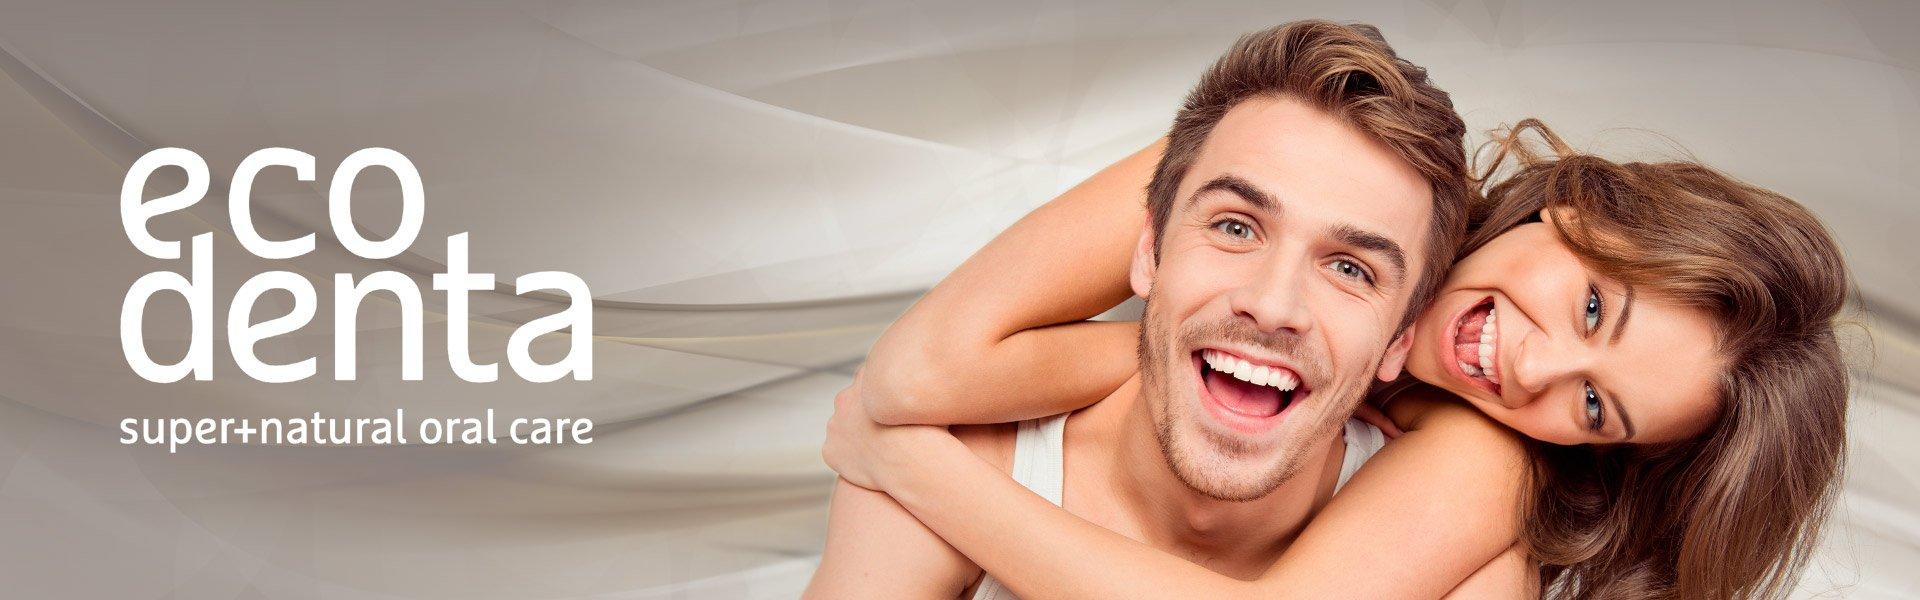 Zobu pasta jutīgiem zobiem bez fluora Ecodenta Cosmos Organic 75 ml                             Ecodenta